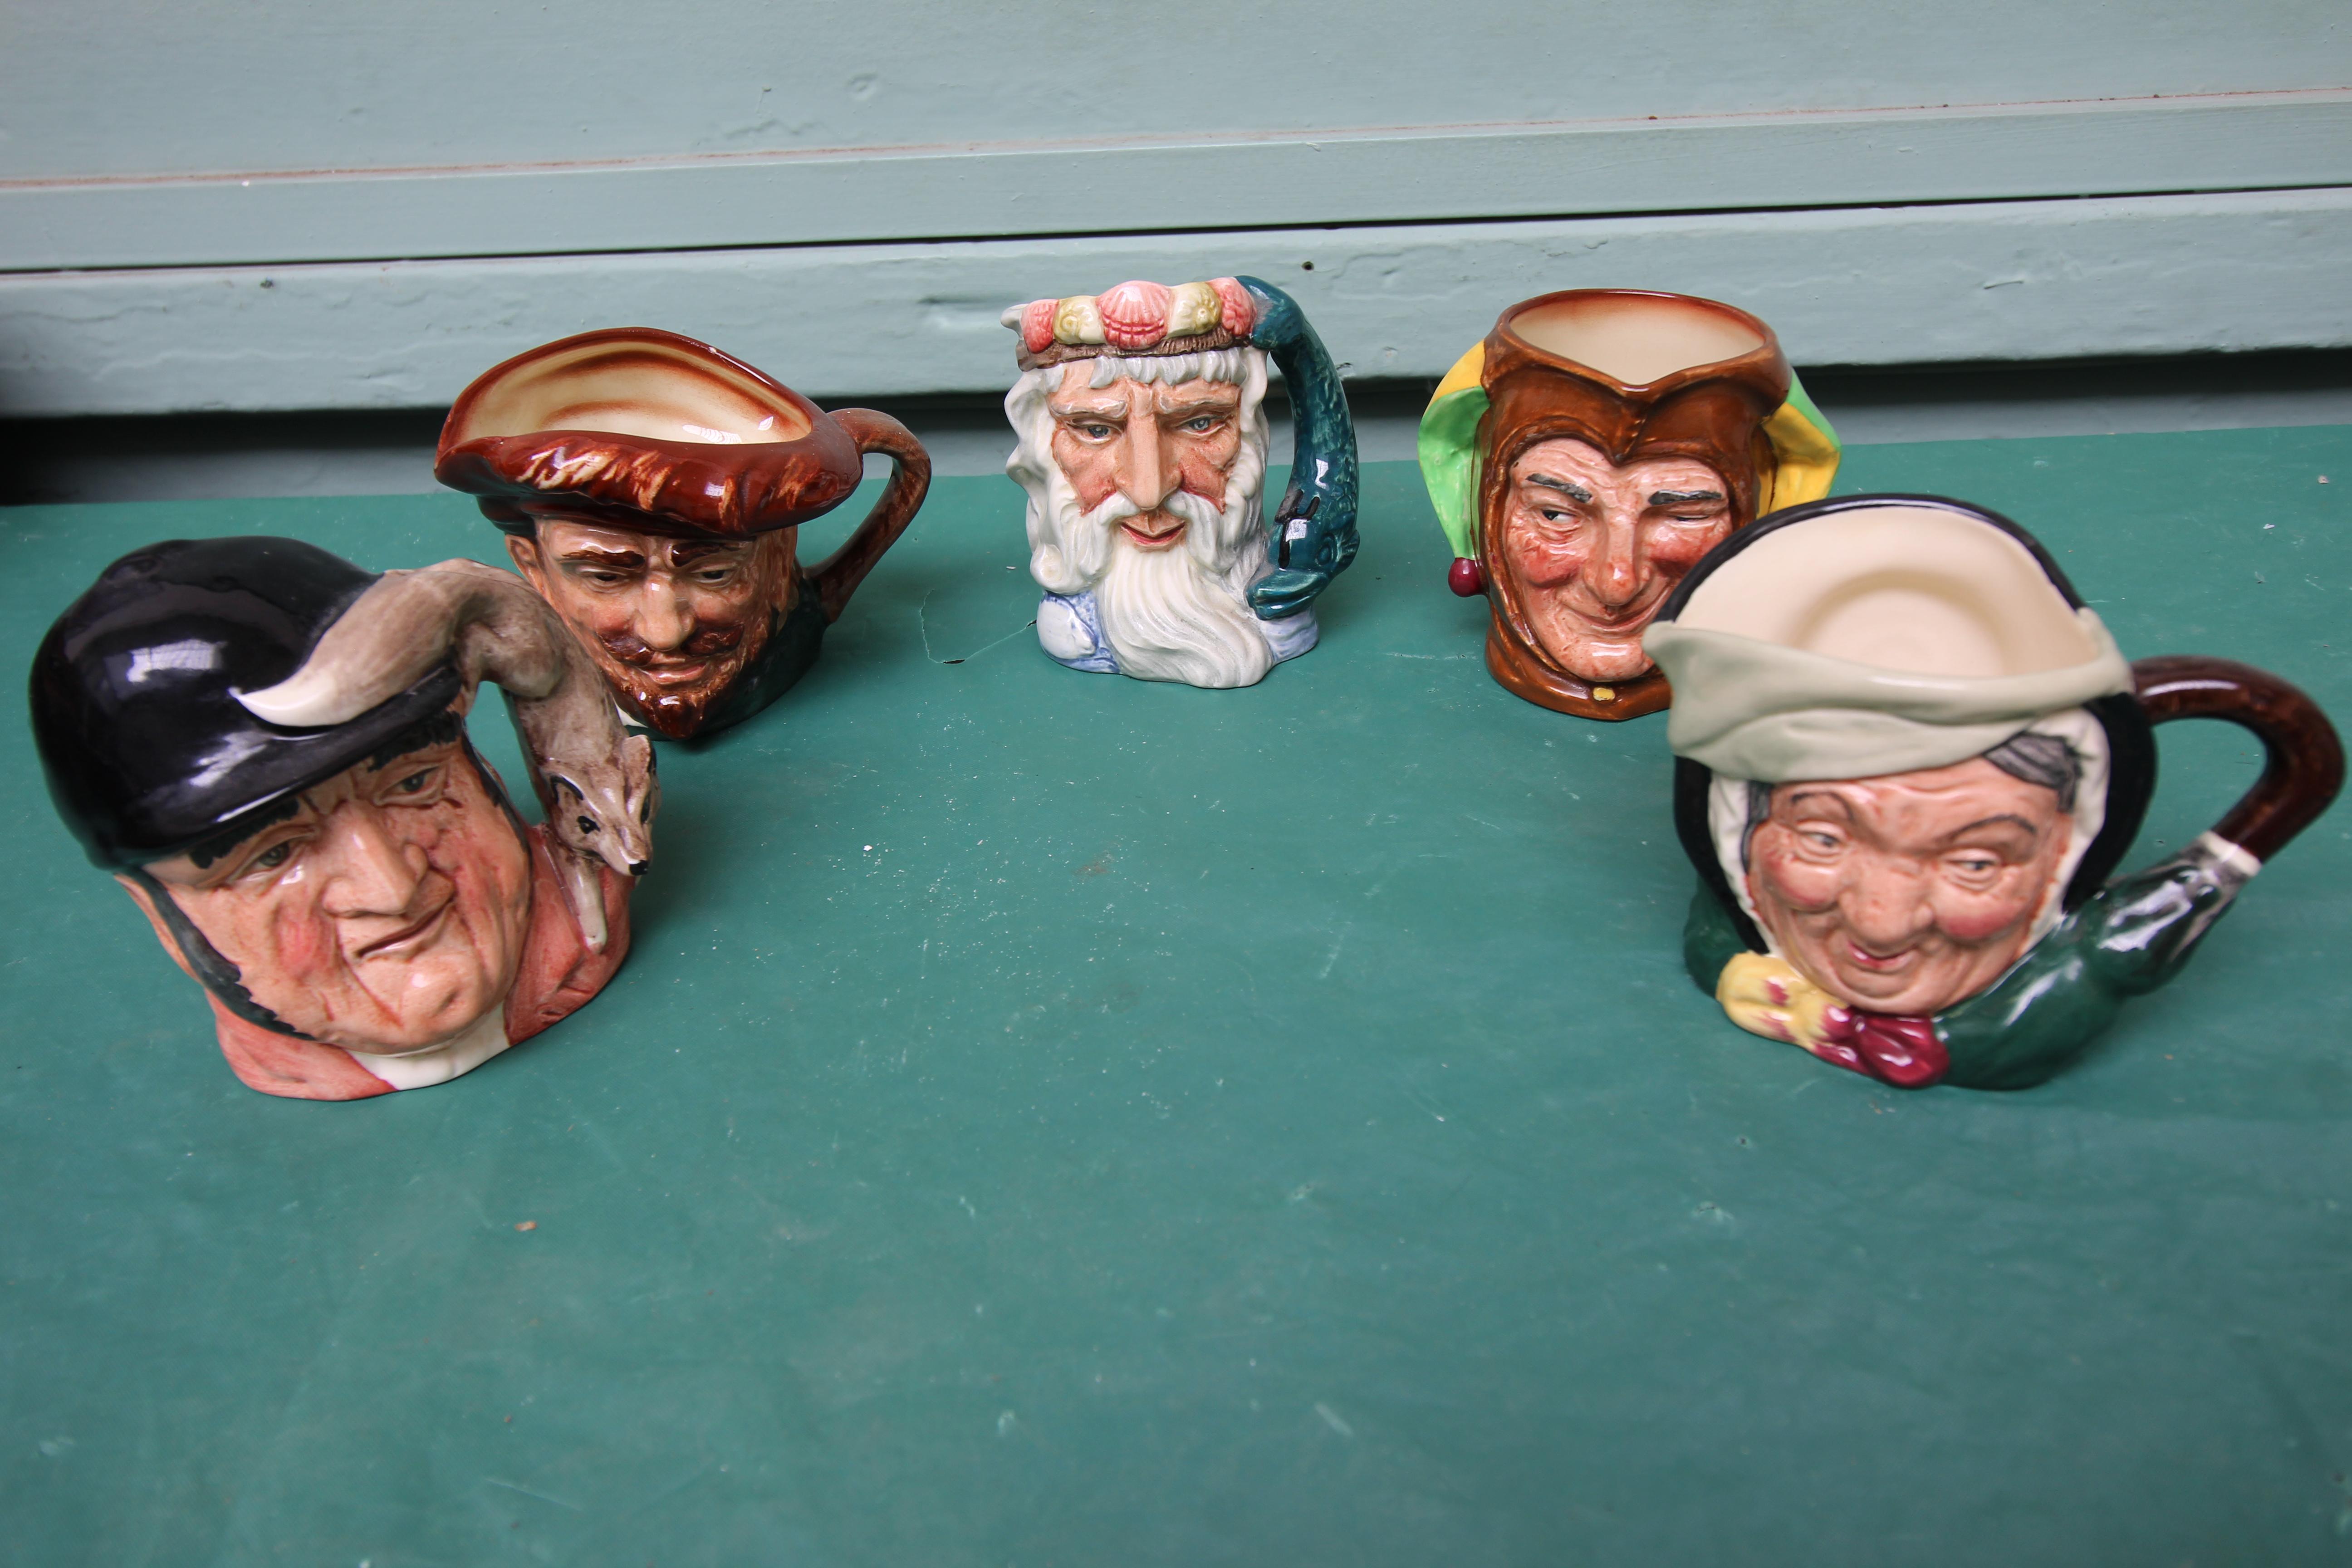 5 miniature Royal Doulton character jugs incl. Gone away, Sairey Gamp, Neptune etc.